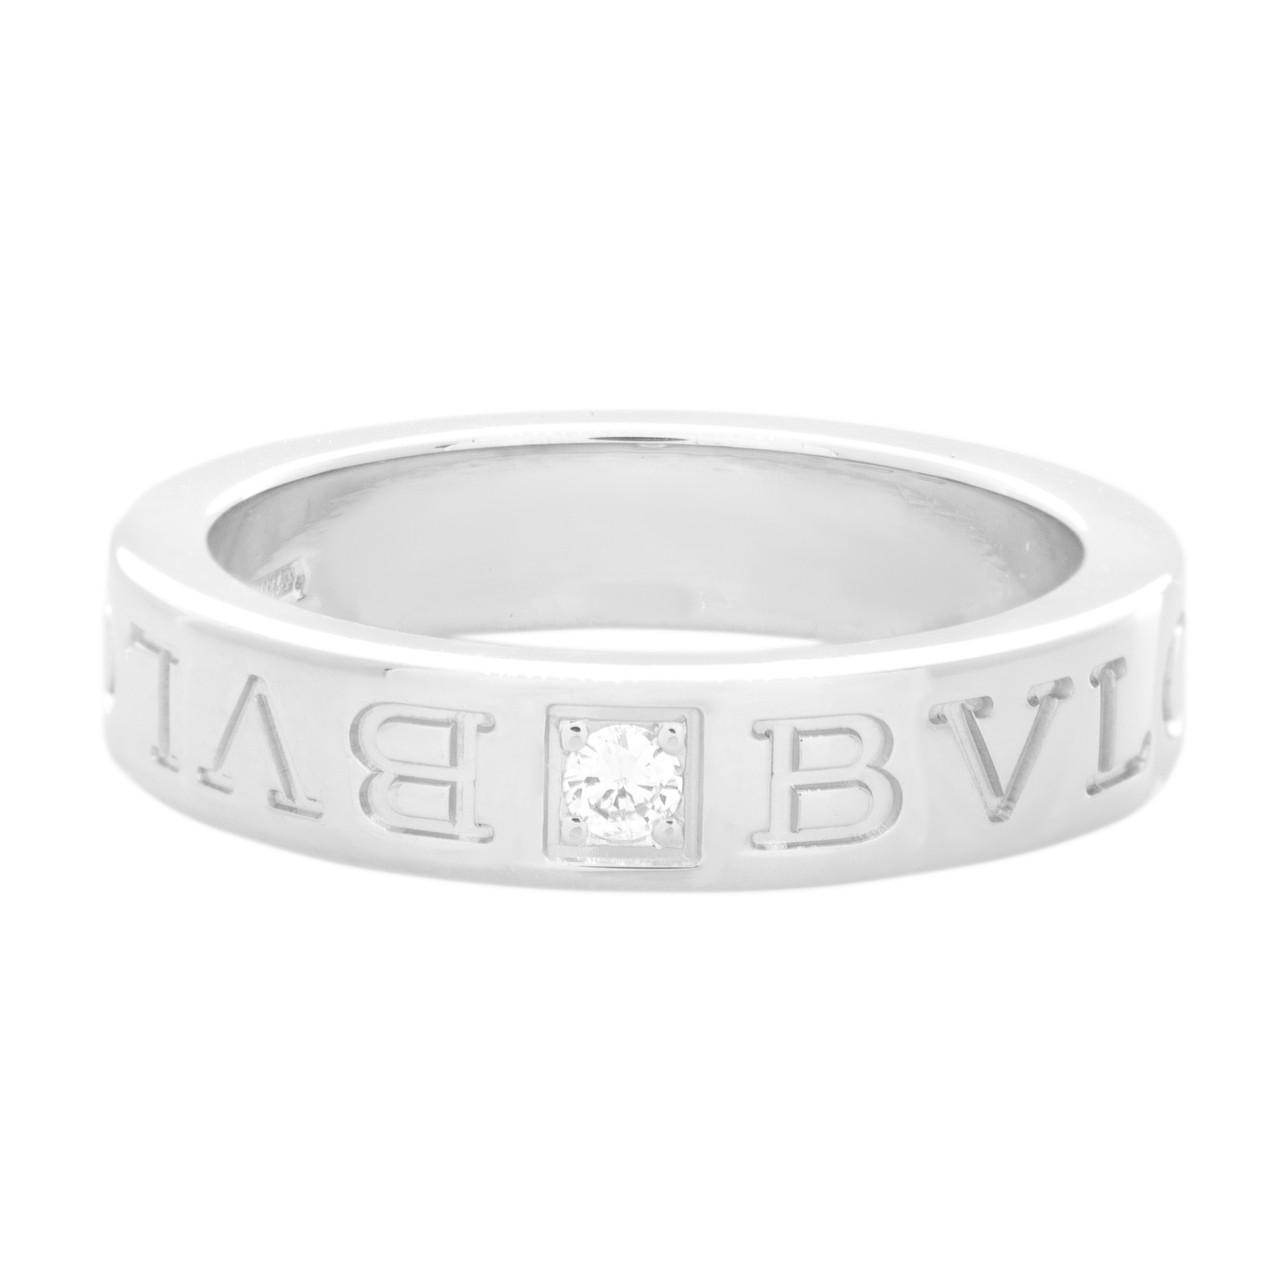 1eac5568f Bvlgari 18K White Gold Diamond Band Ring - modaselle